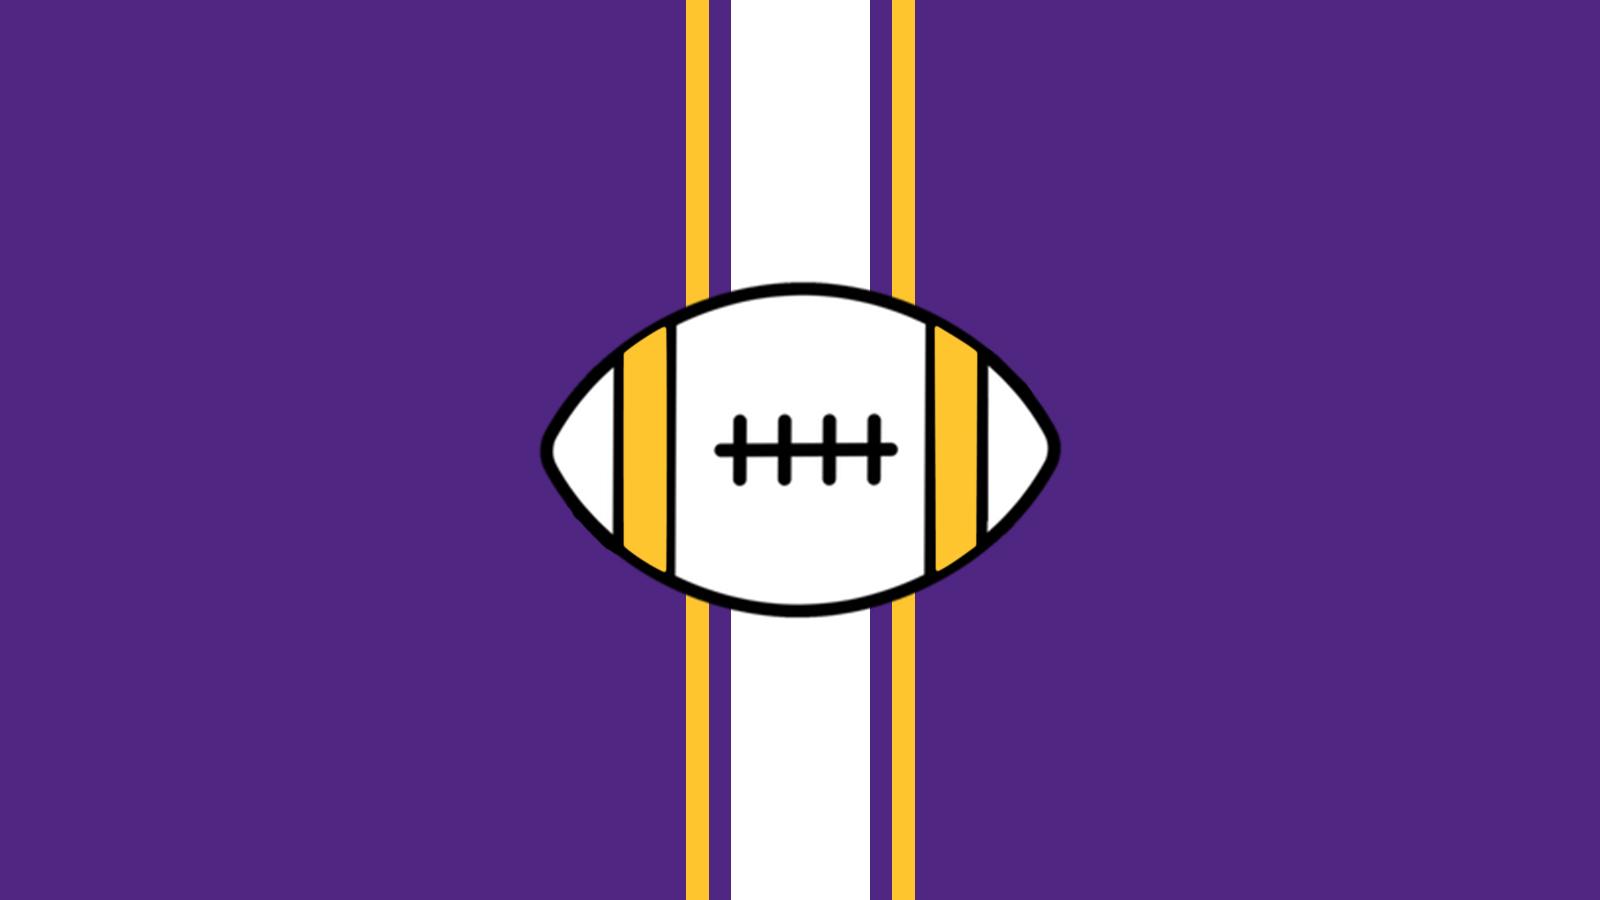 Minnesota Vikings Playoff Tickets